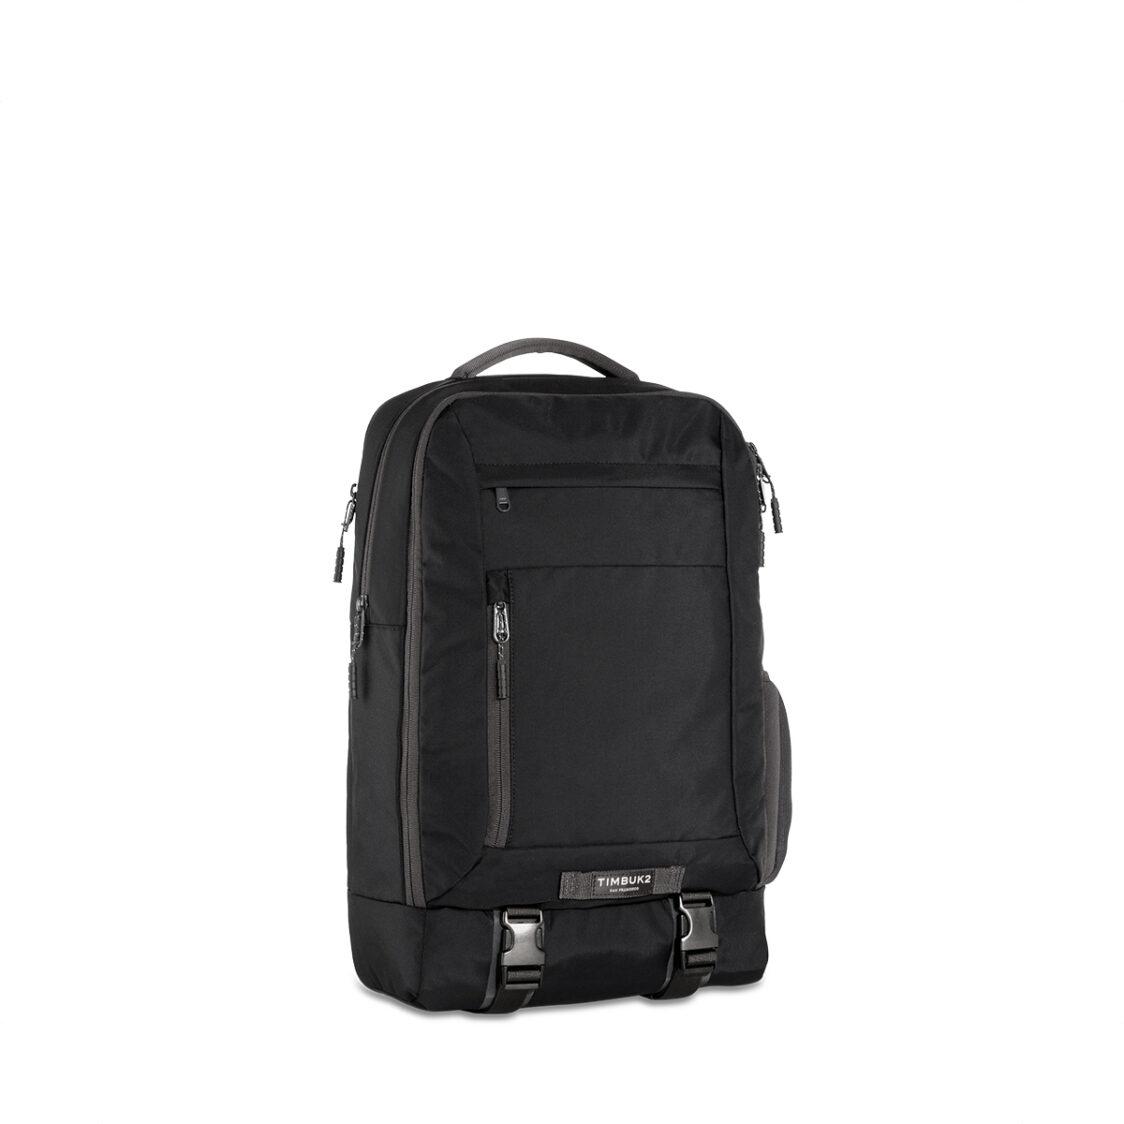 Timbuk2 Authority Laptop Backpack - Jet Black